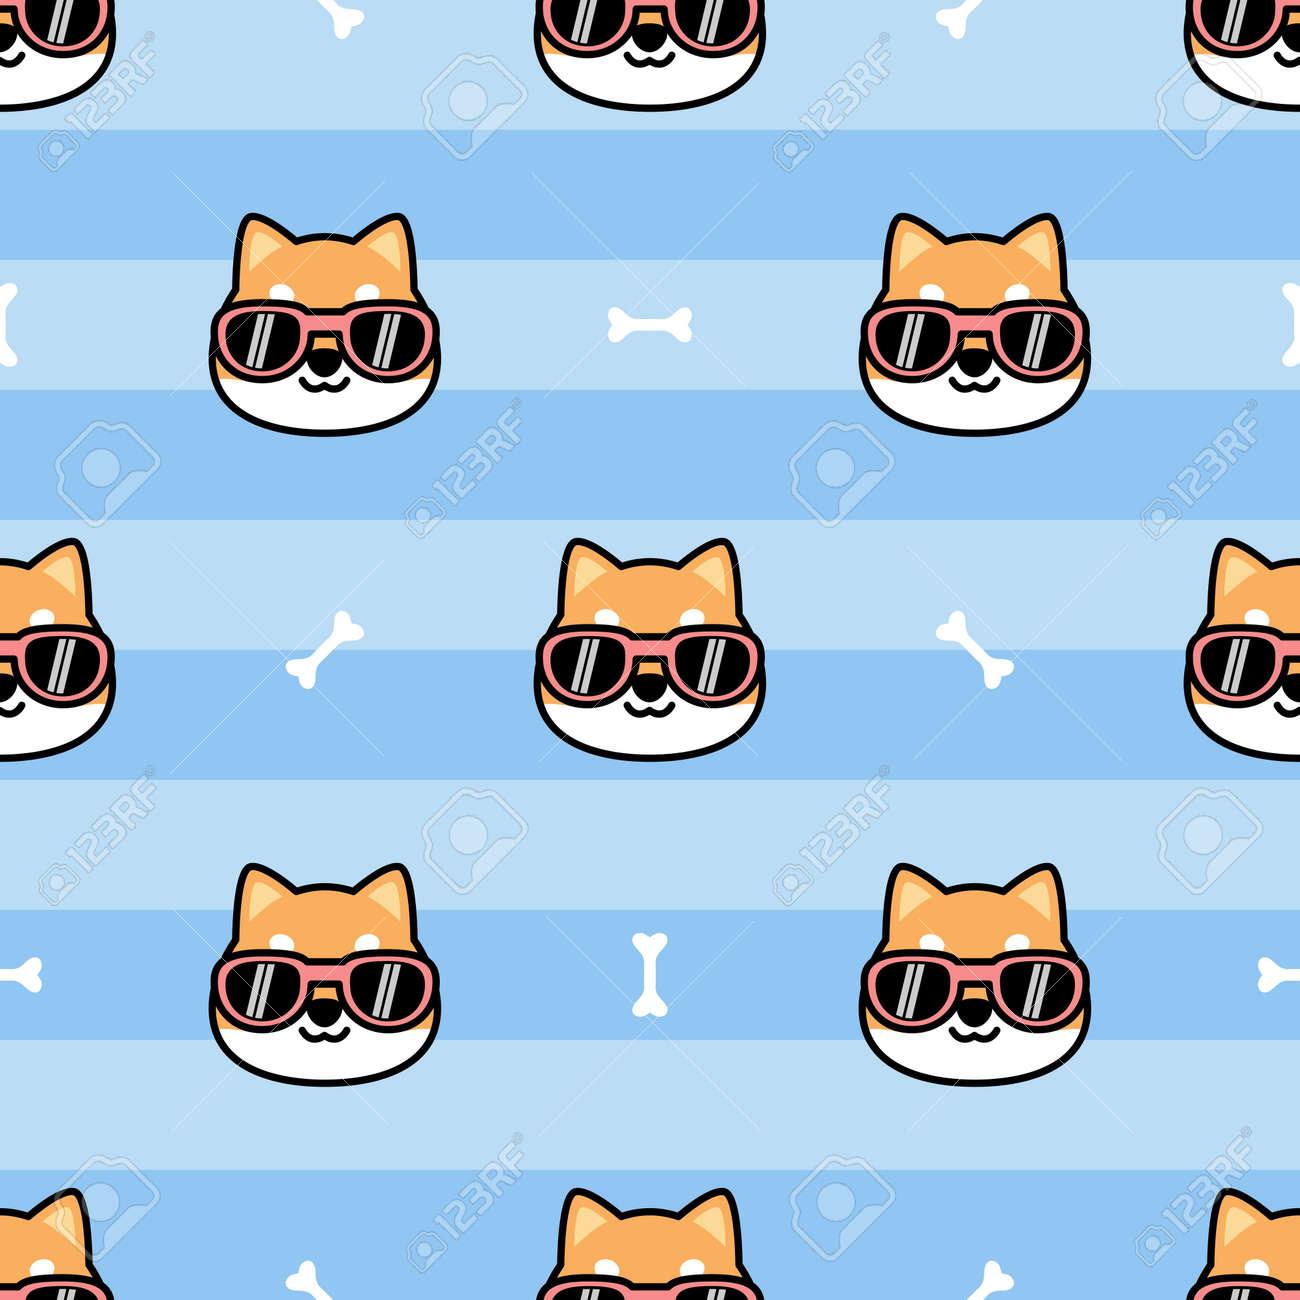 Cute shiba inu dog face with sunglasses cartoon seamless pattern, vector illustration - 164045121